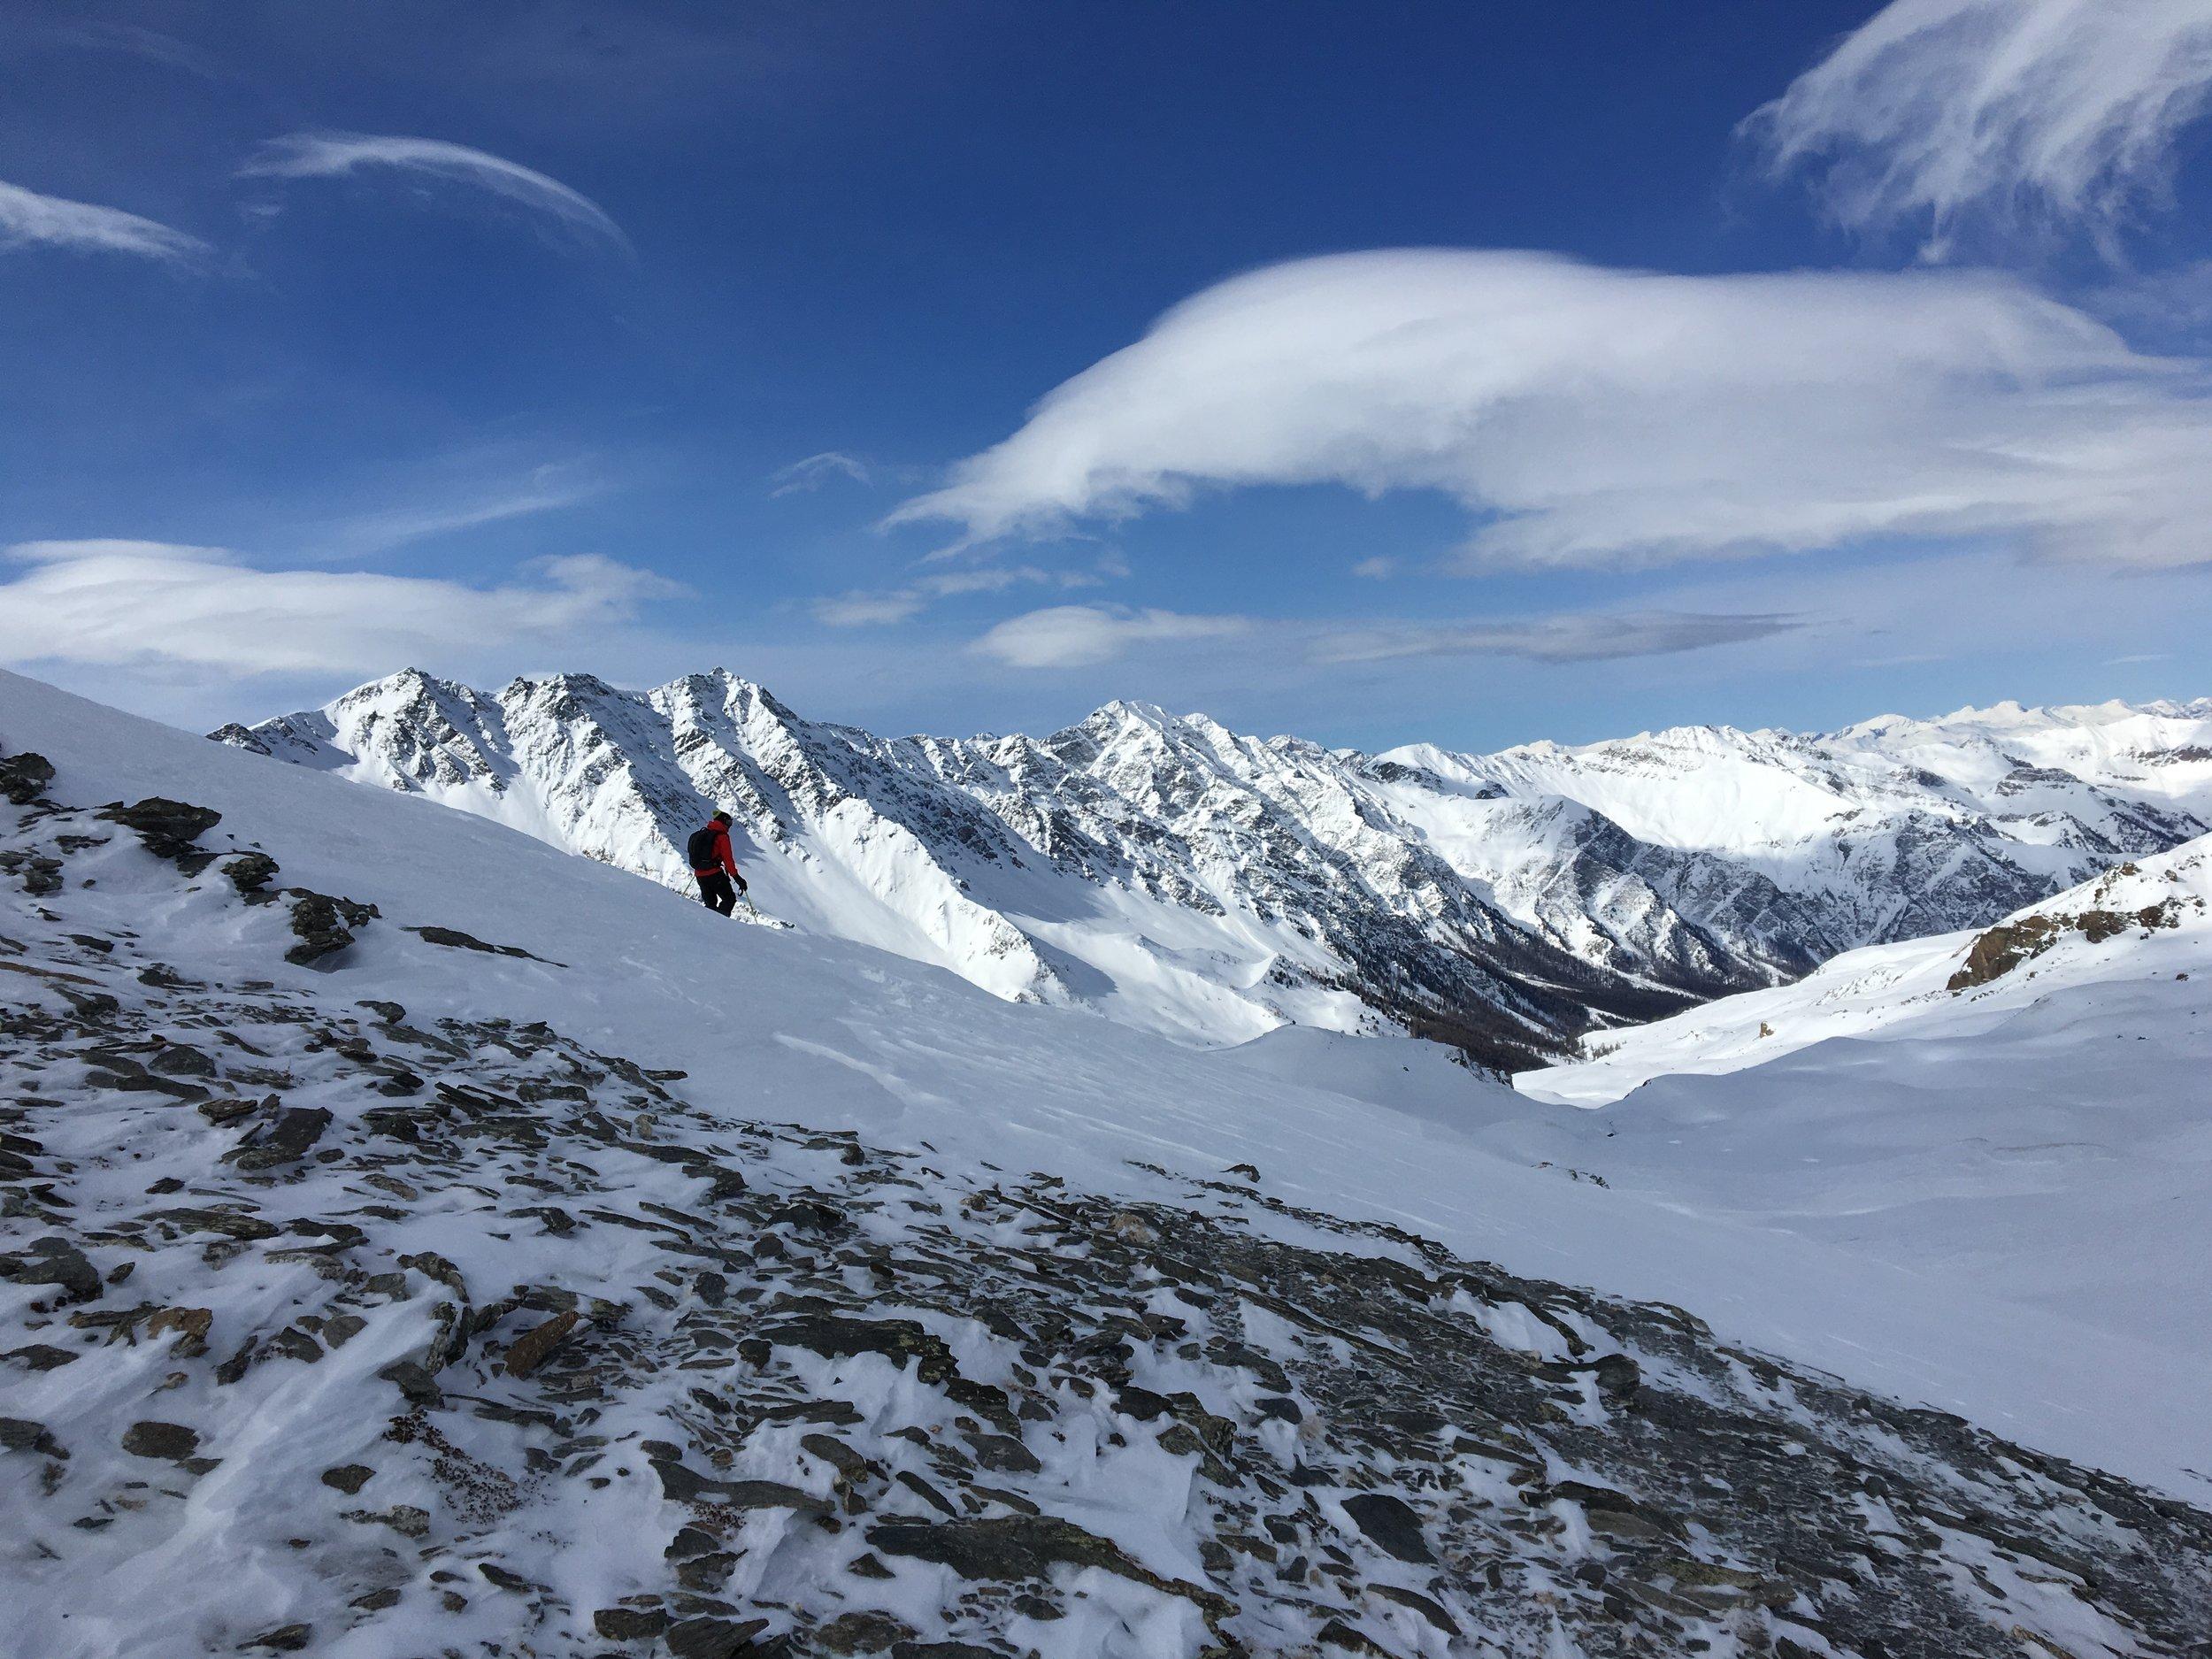 Ski touring in the nearby Queyras